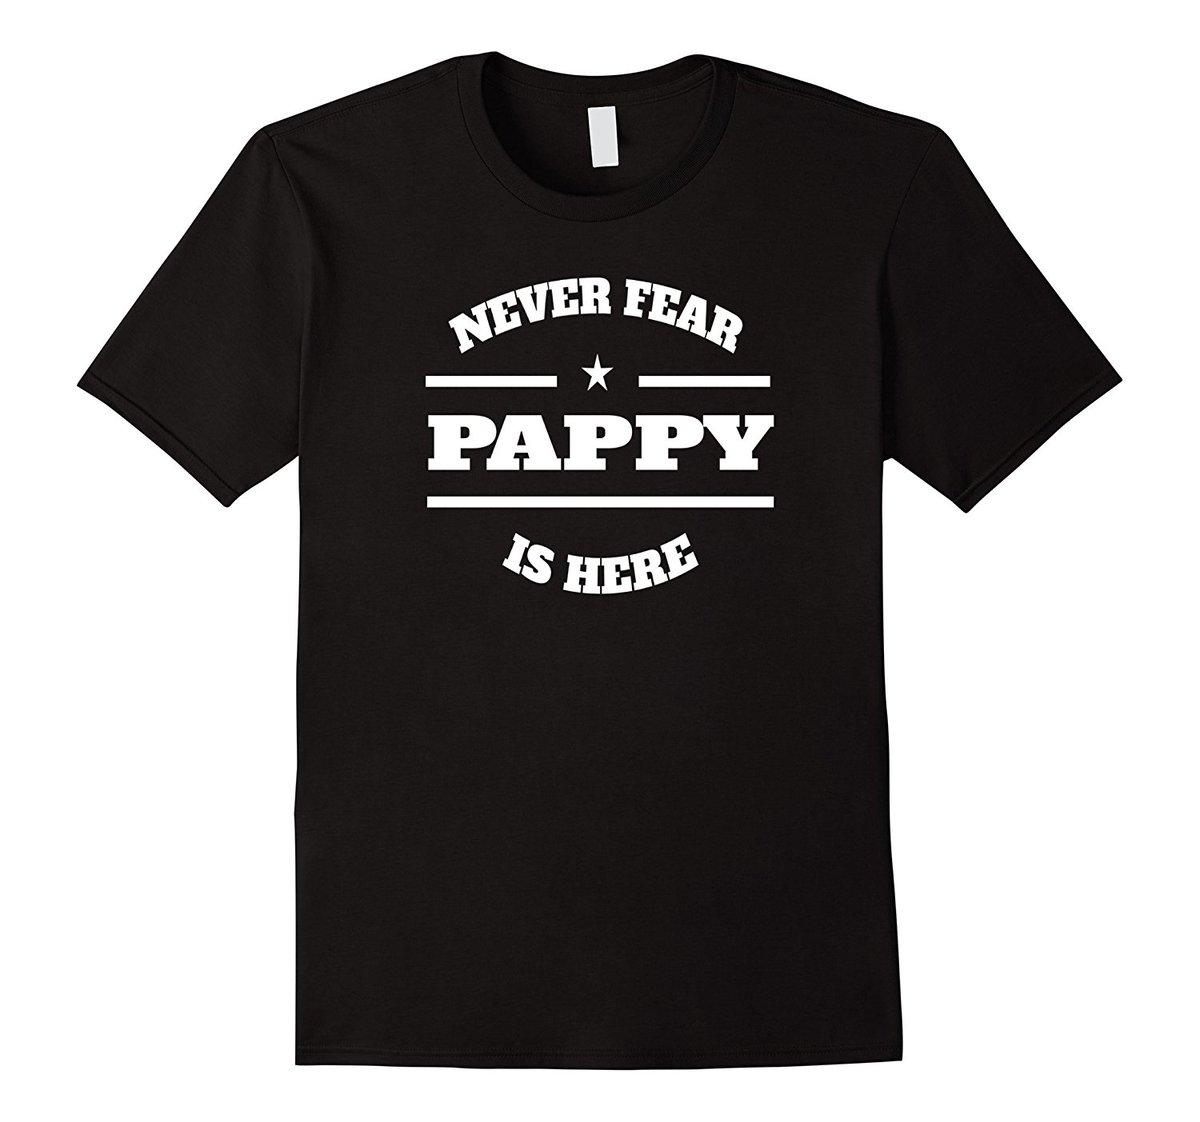 #Pappy Gift T-Shirt - #GrandparentsDay - Never Fear https://t.co/aFSvtIcJdC # https://t.co/UDgXJRLlz7